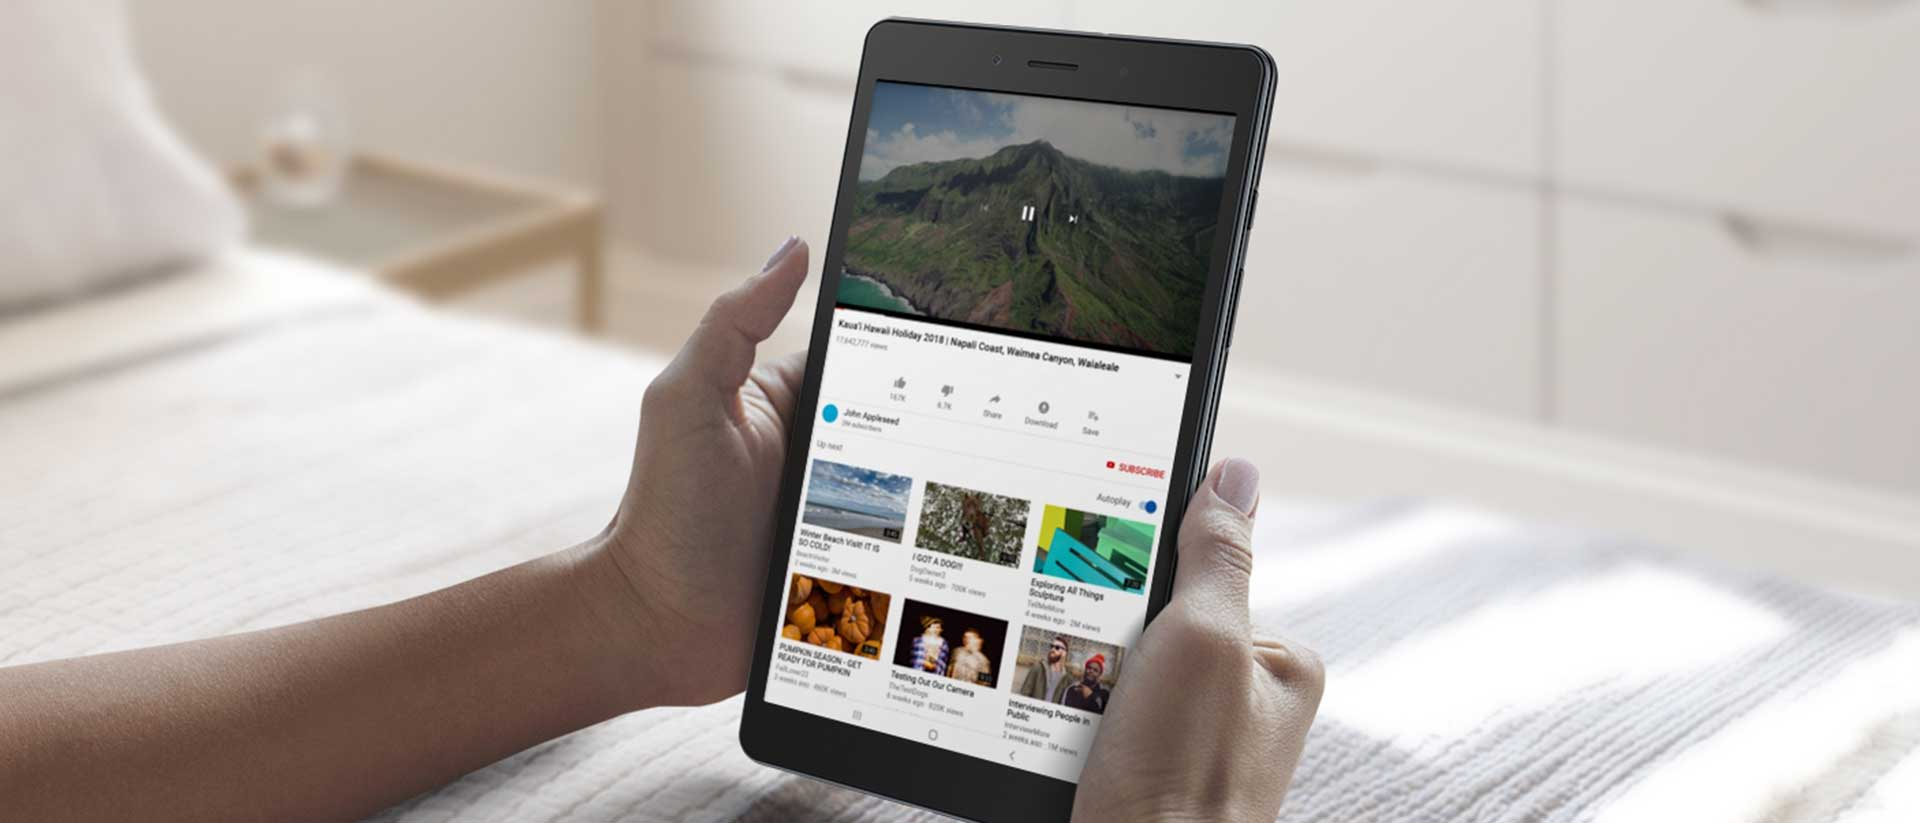 تبلت سامسونگ مدل Galaxy Tab A 8.0 ظرفیت 32 گیگابایت - موبایلتو